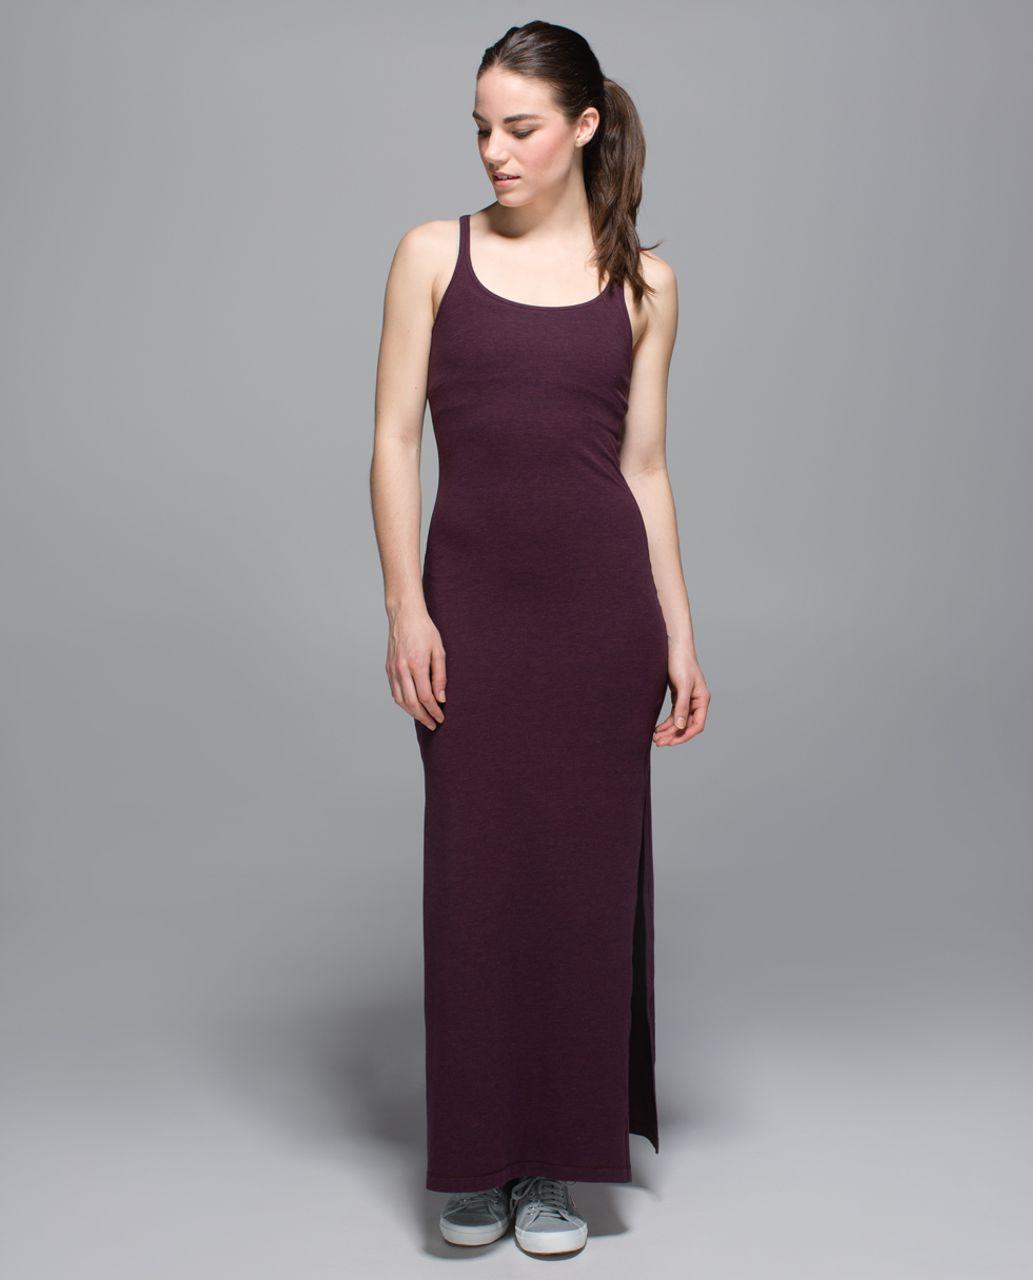 d32b31de8b Lululemon Refresh Maxi Dress - Heathered Bordeaux Drama   Black Cherry -  lulu fanatics